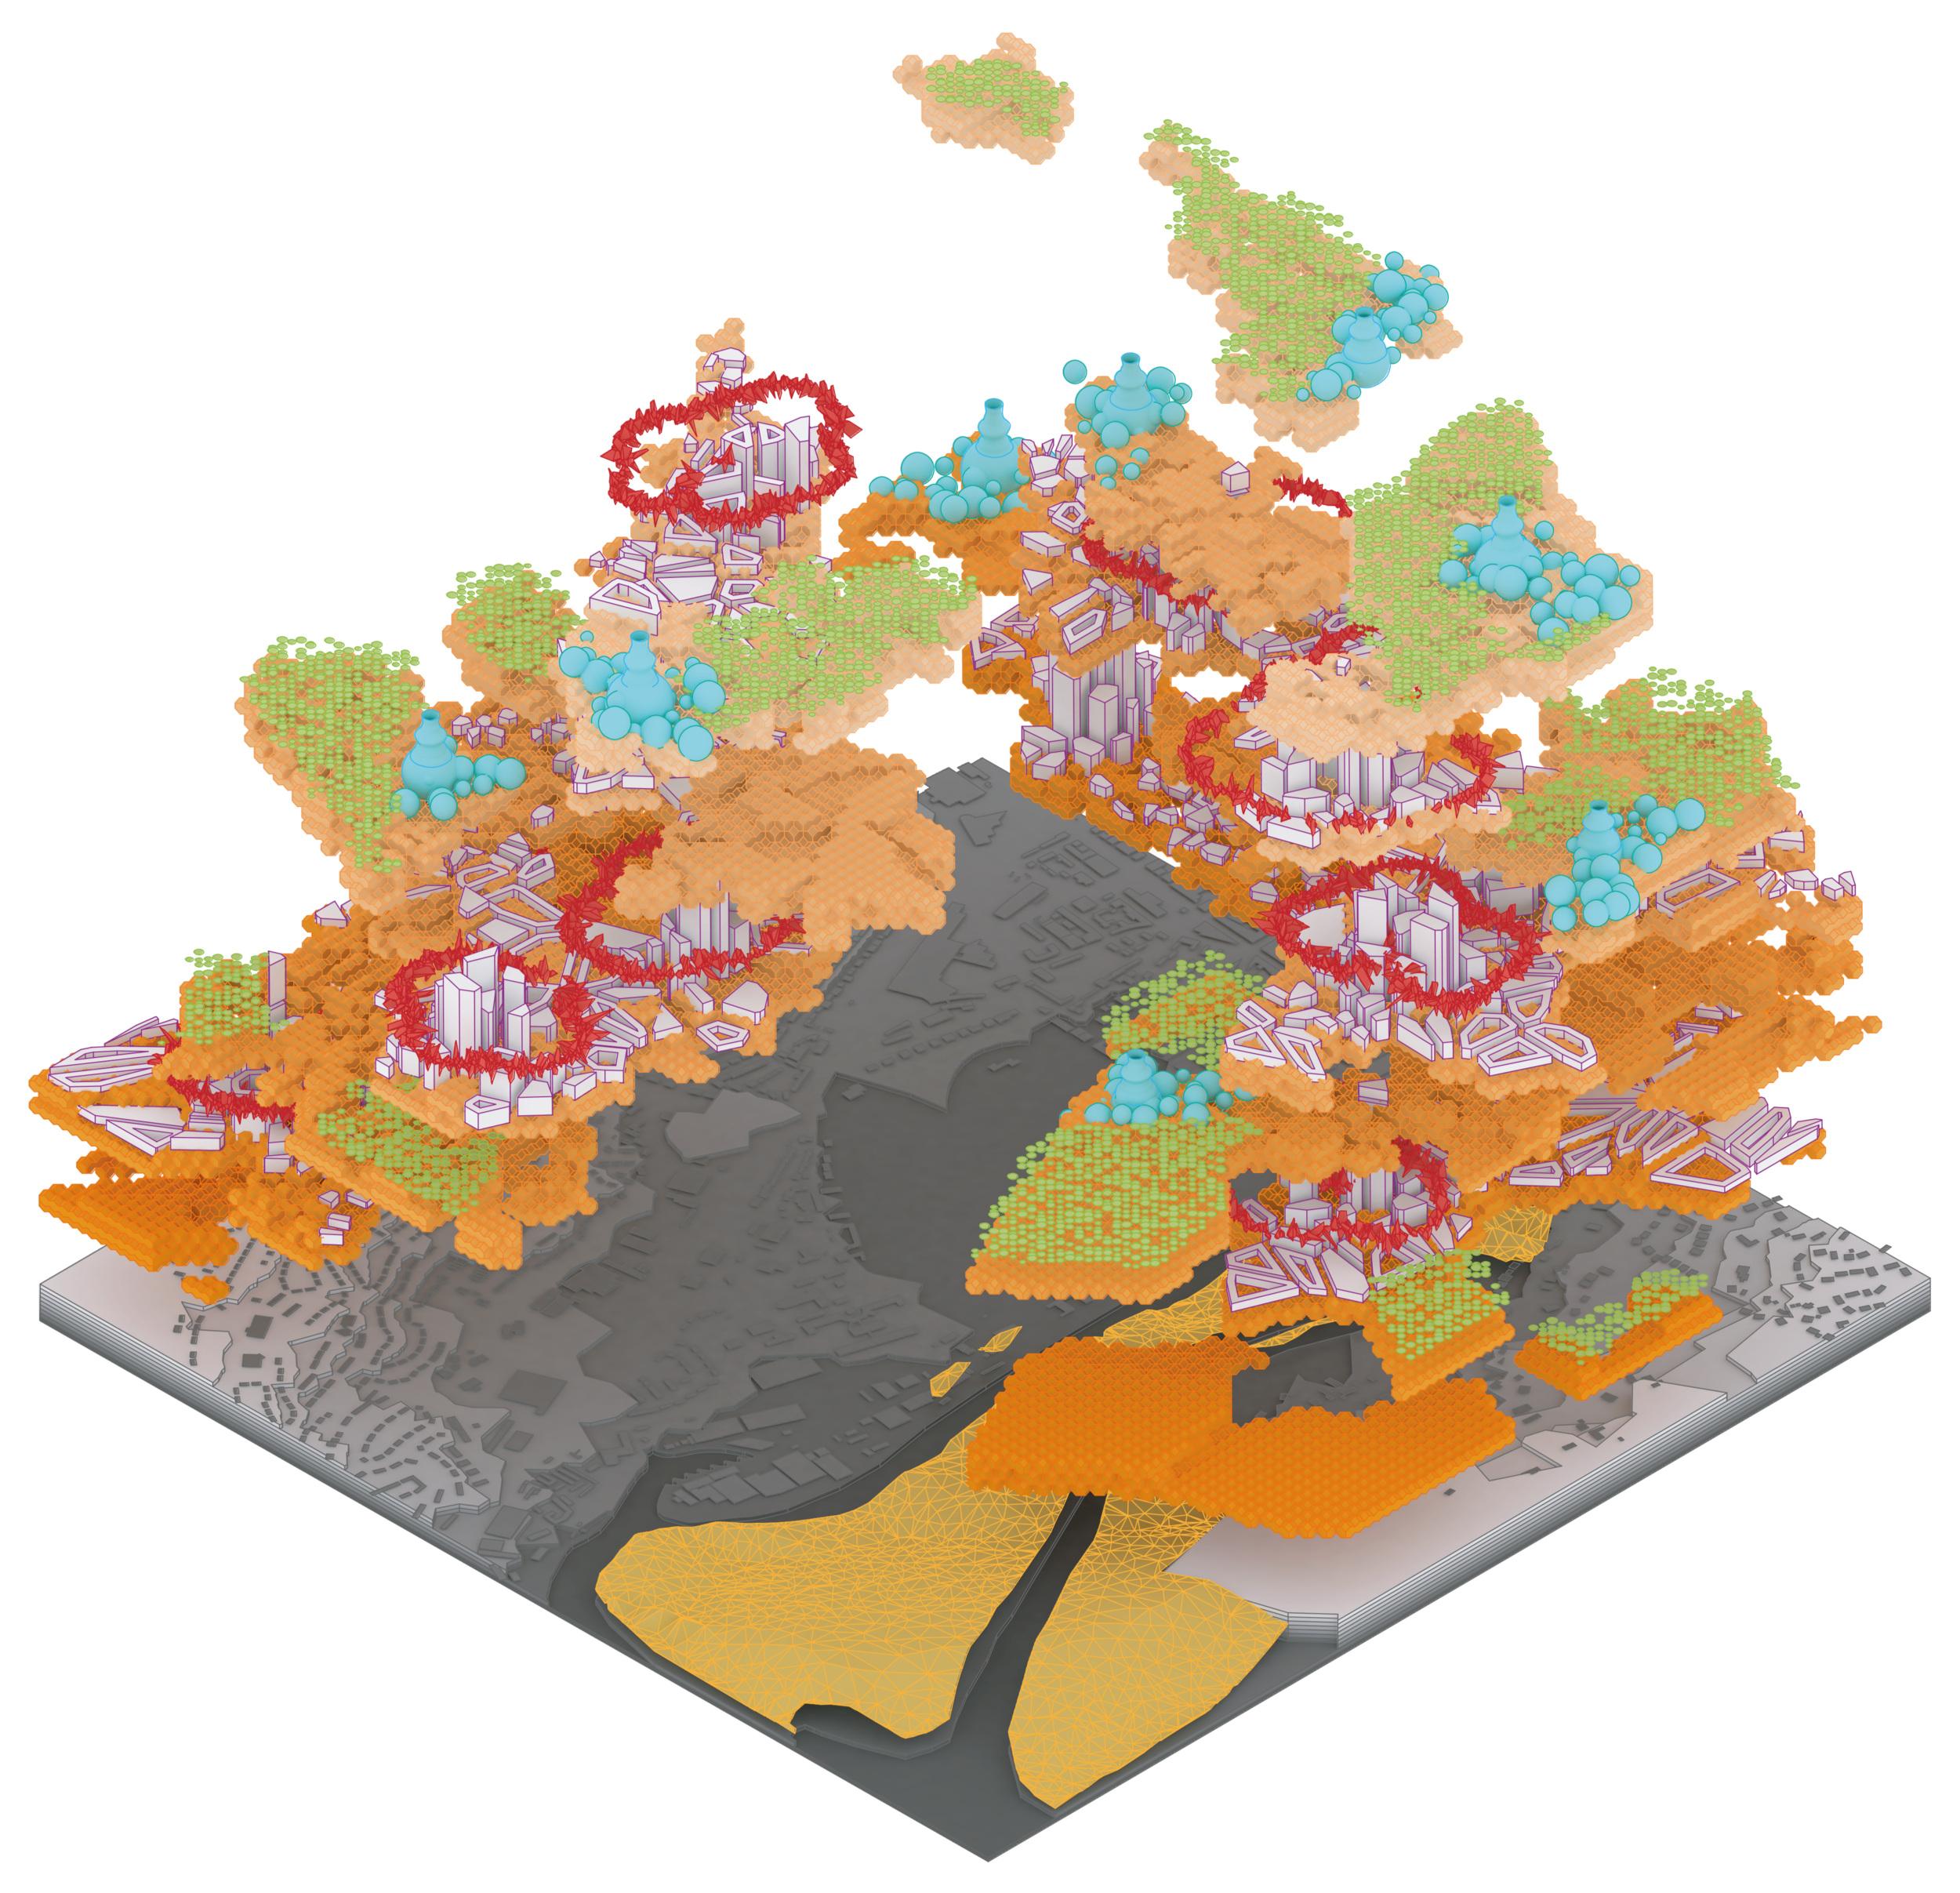 City masterplan